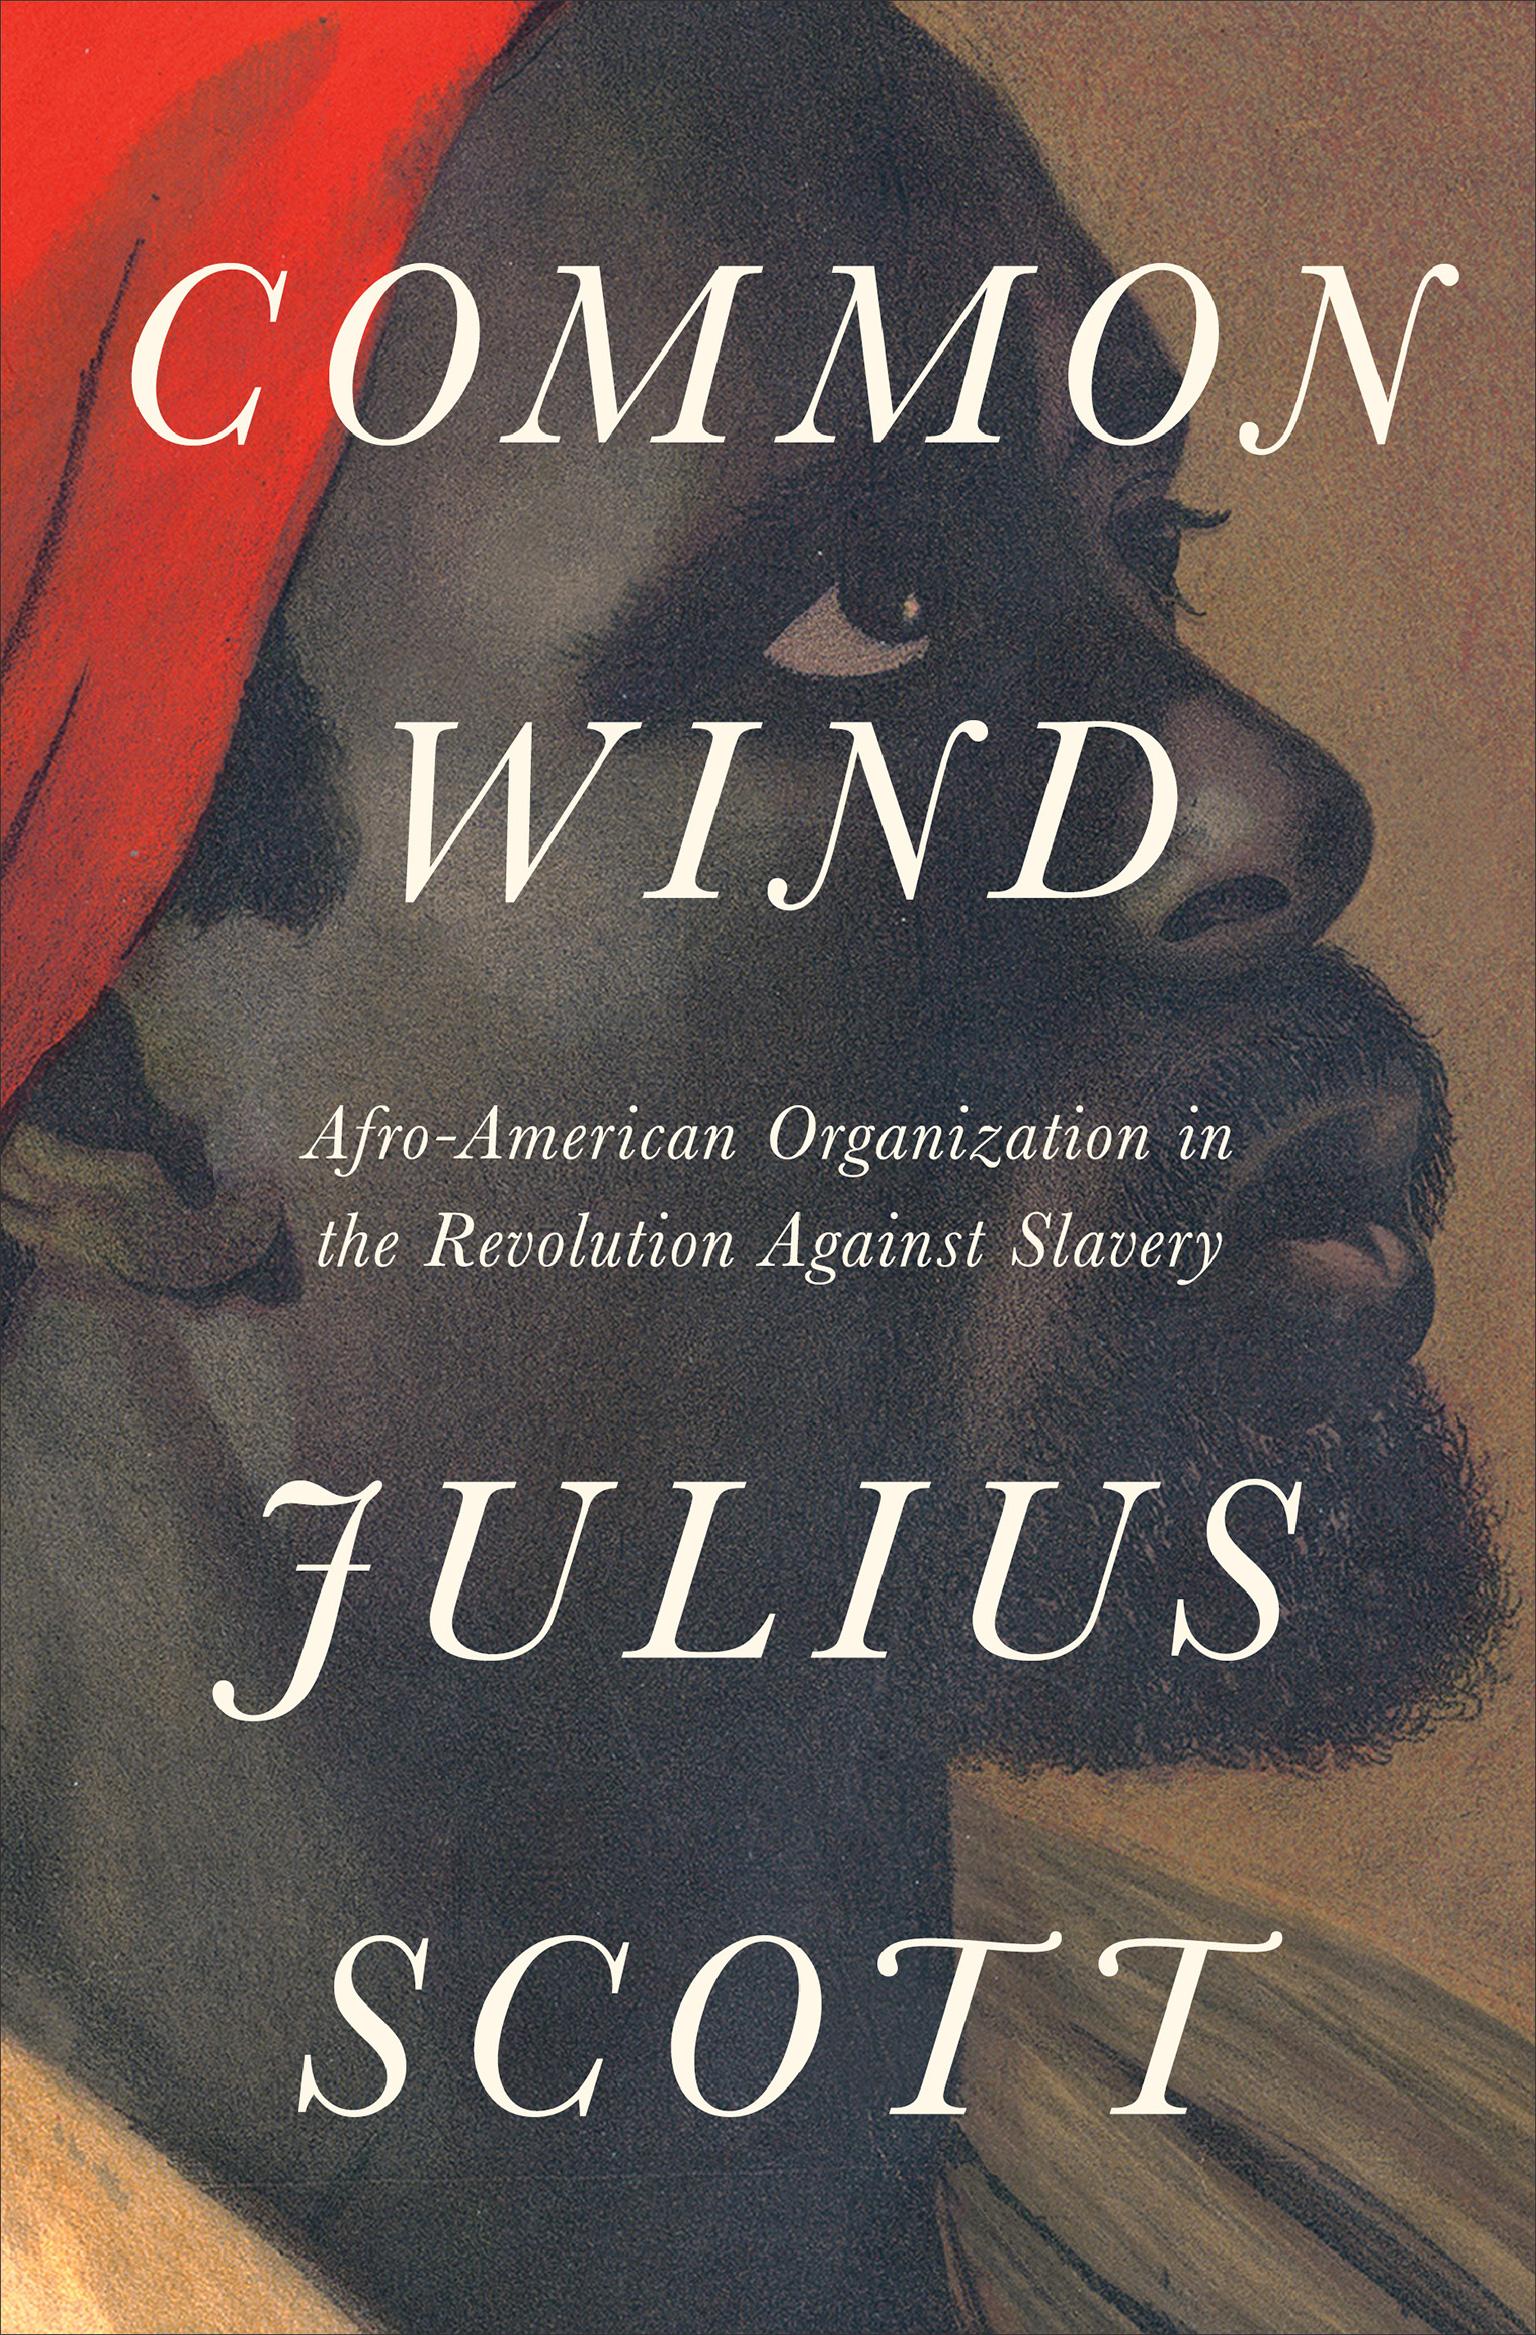 Scott---common-wind-1